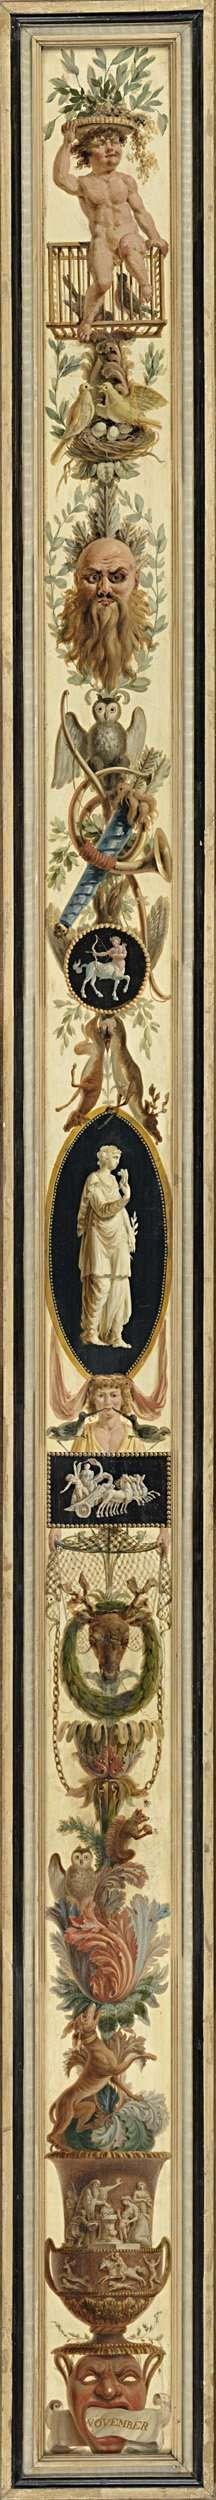 November, with the Sign of Sagittarius, Jan Kamphuysen, 1790 - 1791